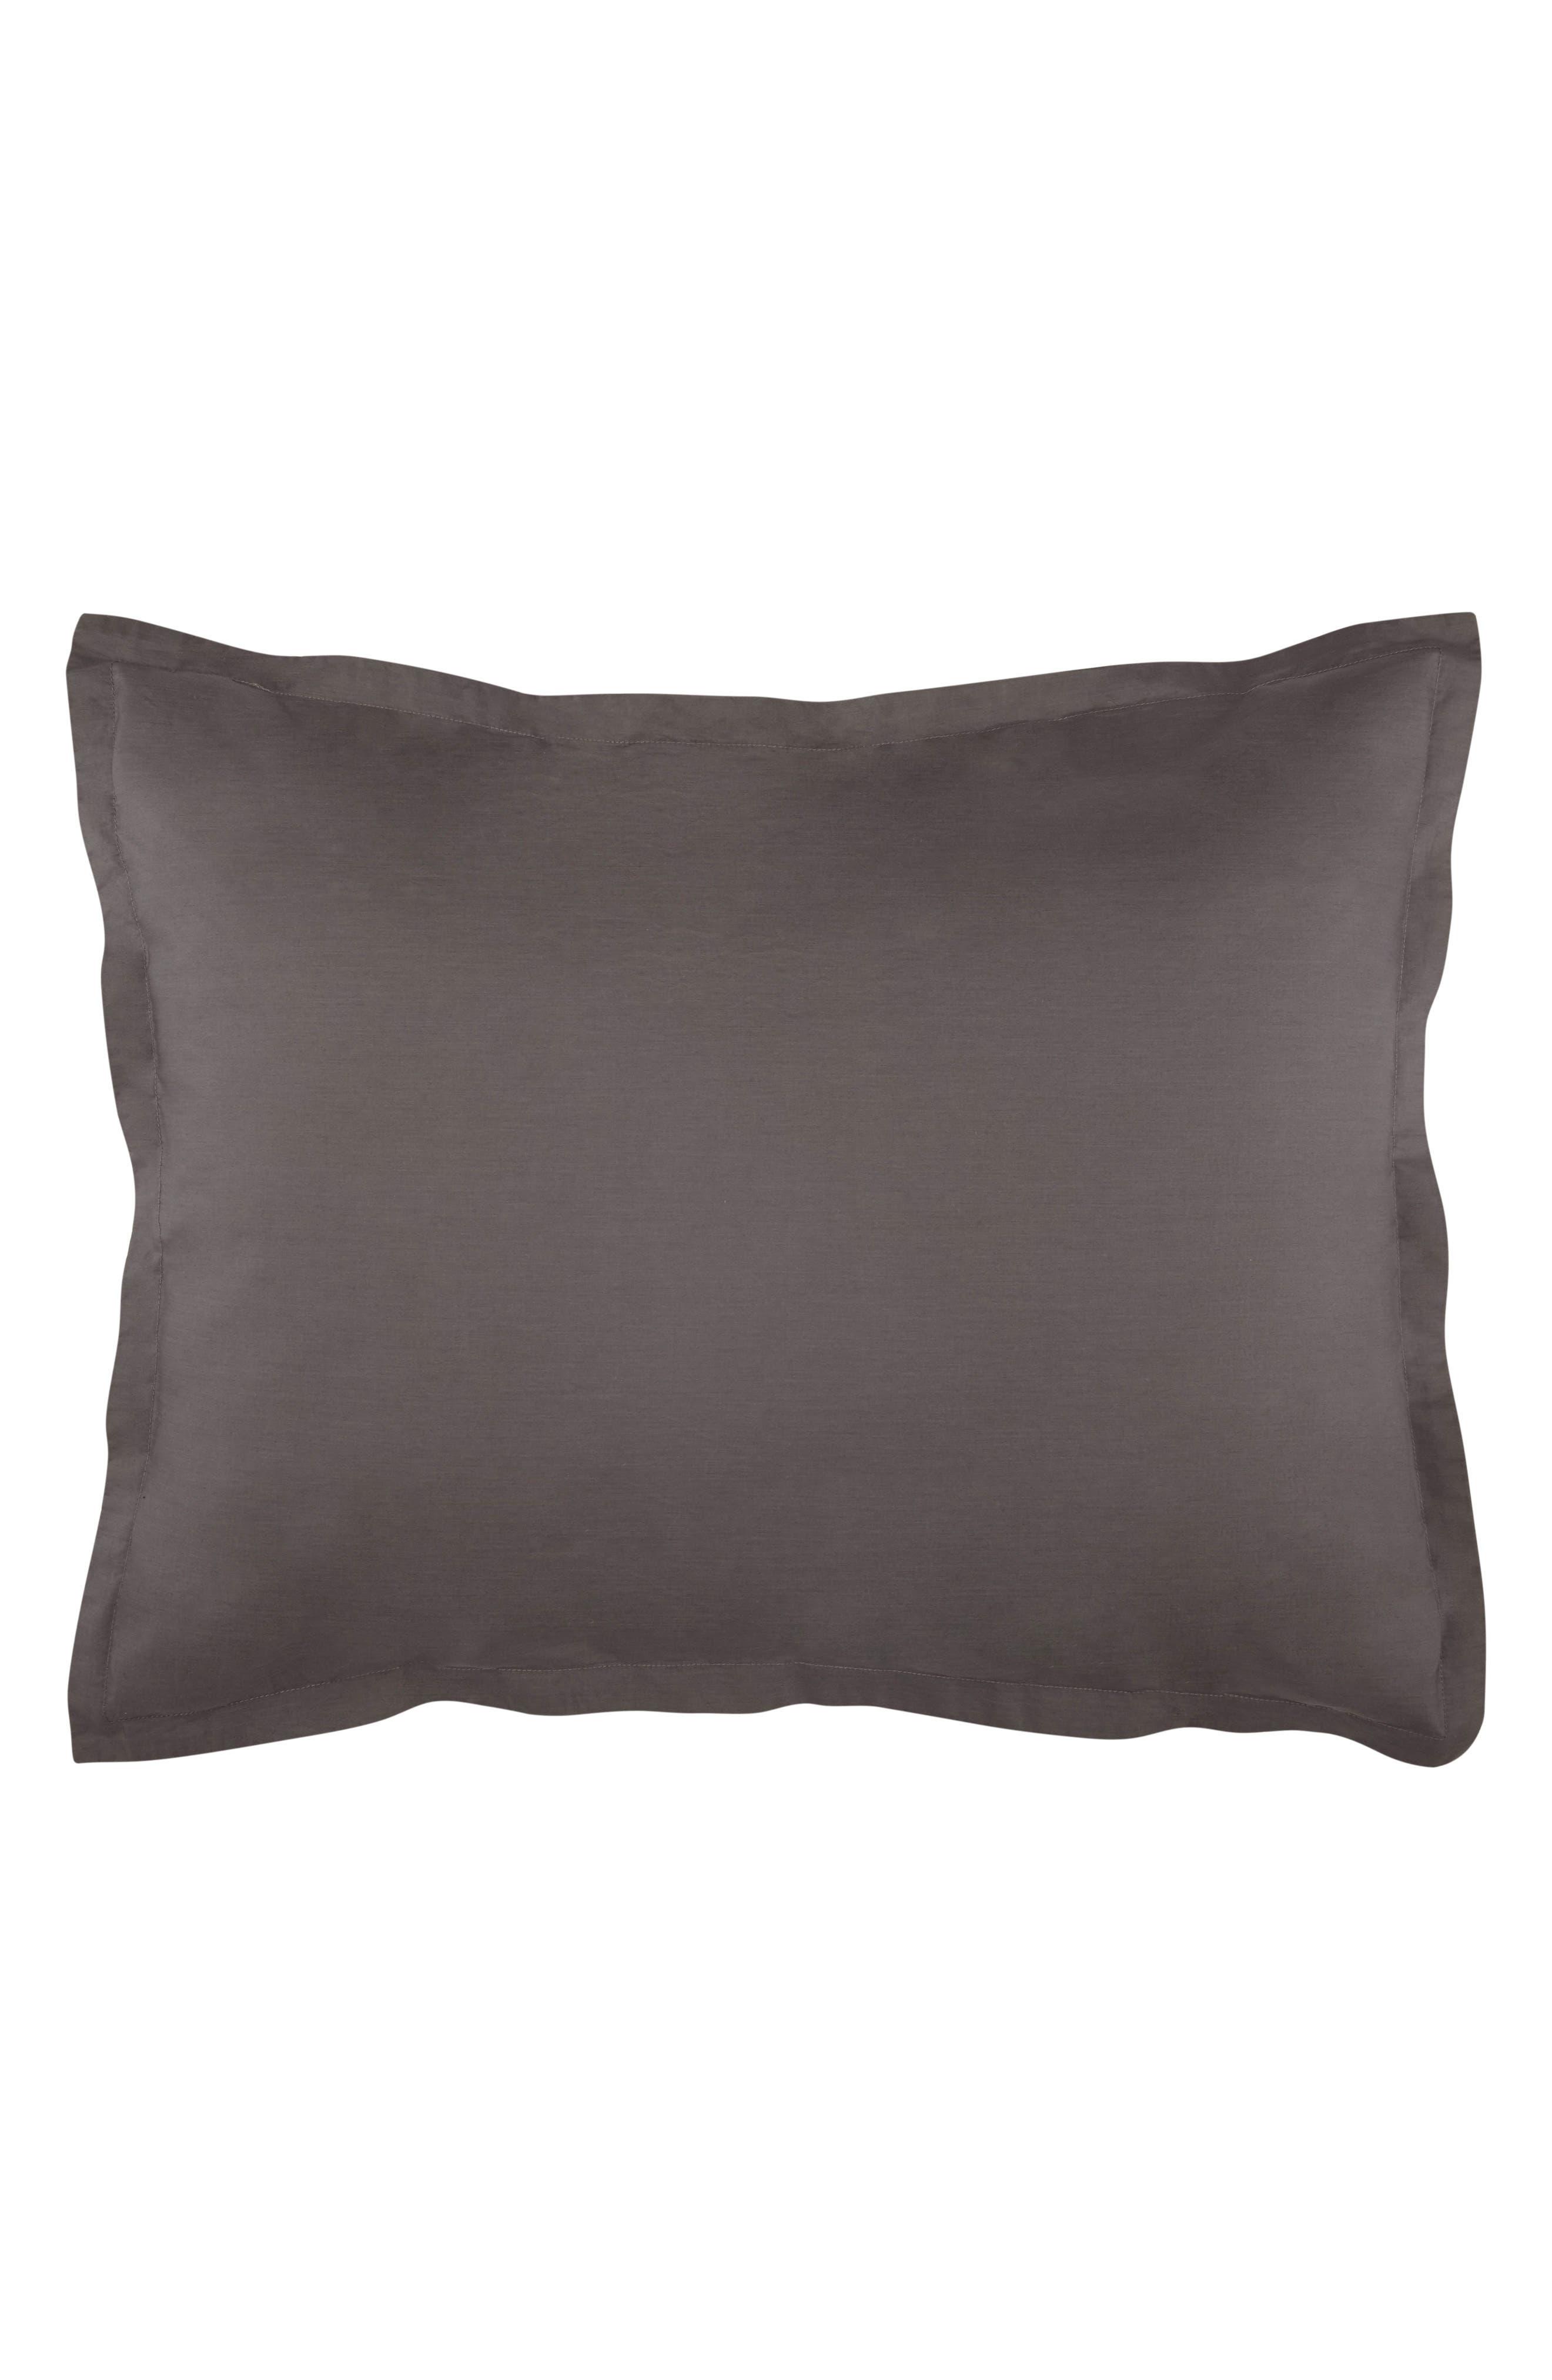 Lorimer 300 Thread Count Pillow Sham,                         Main,                         color, 020